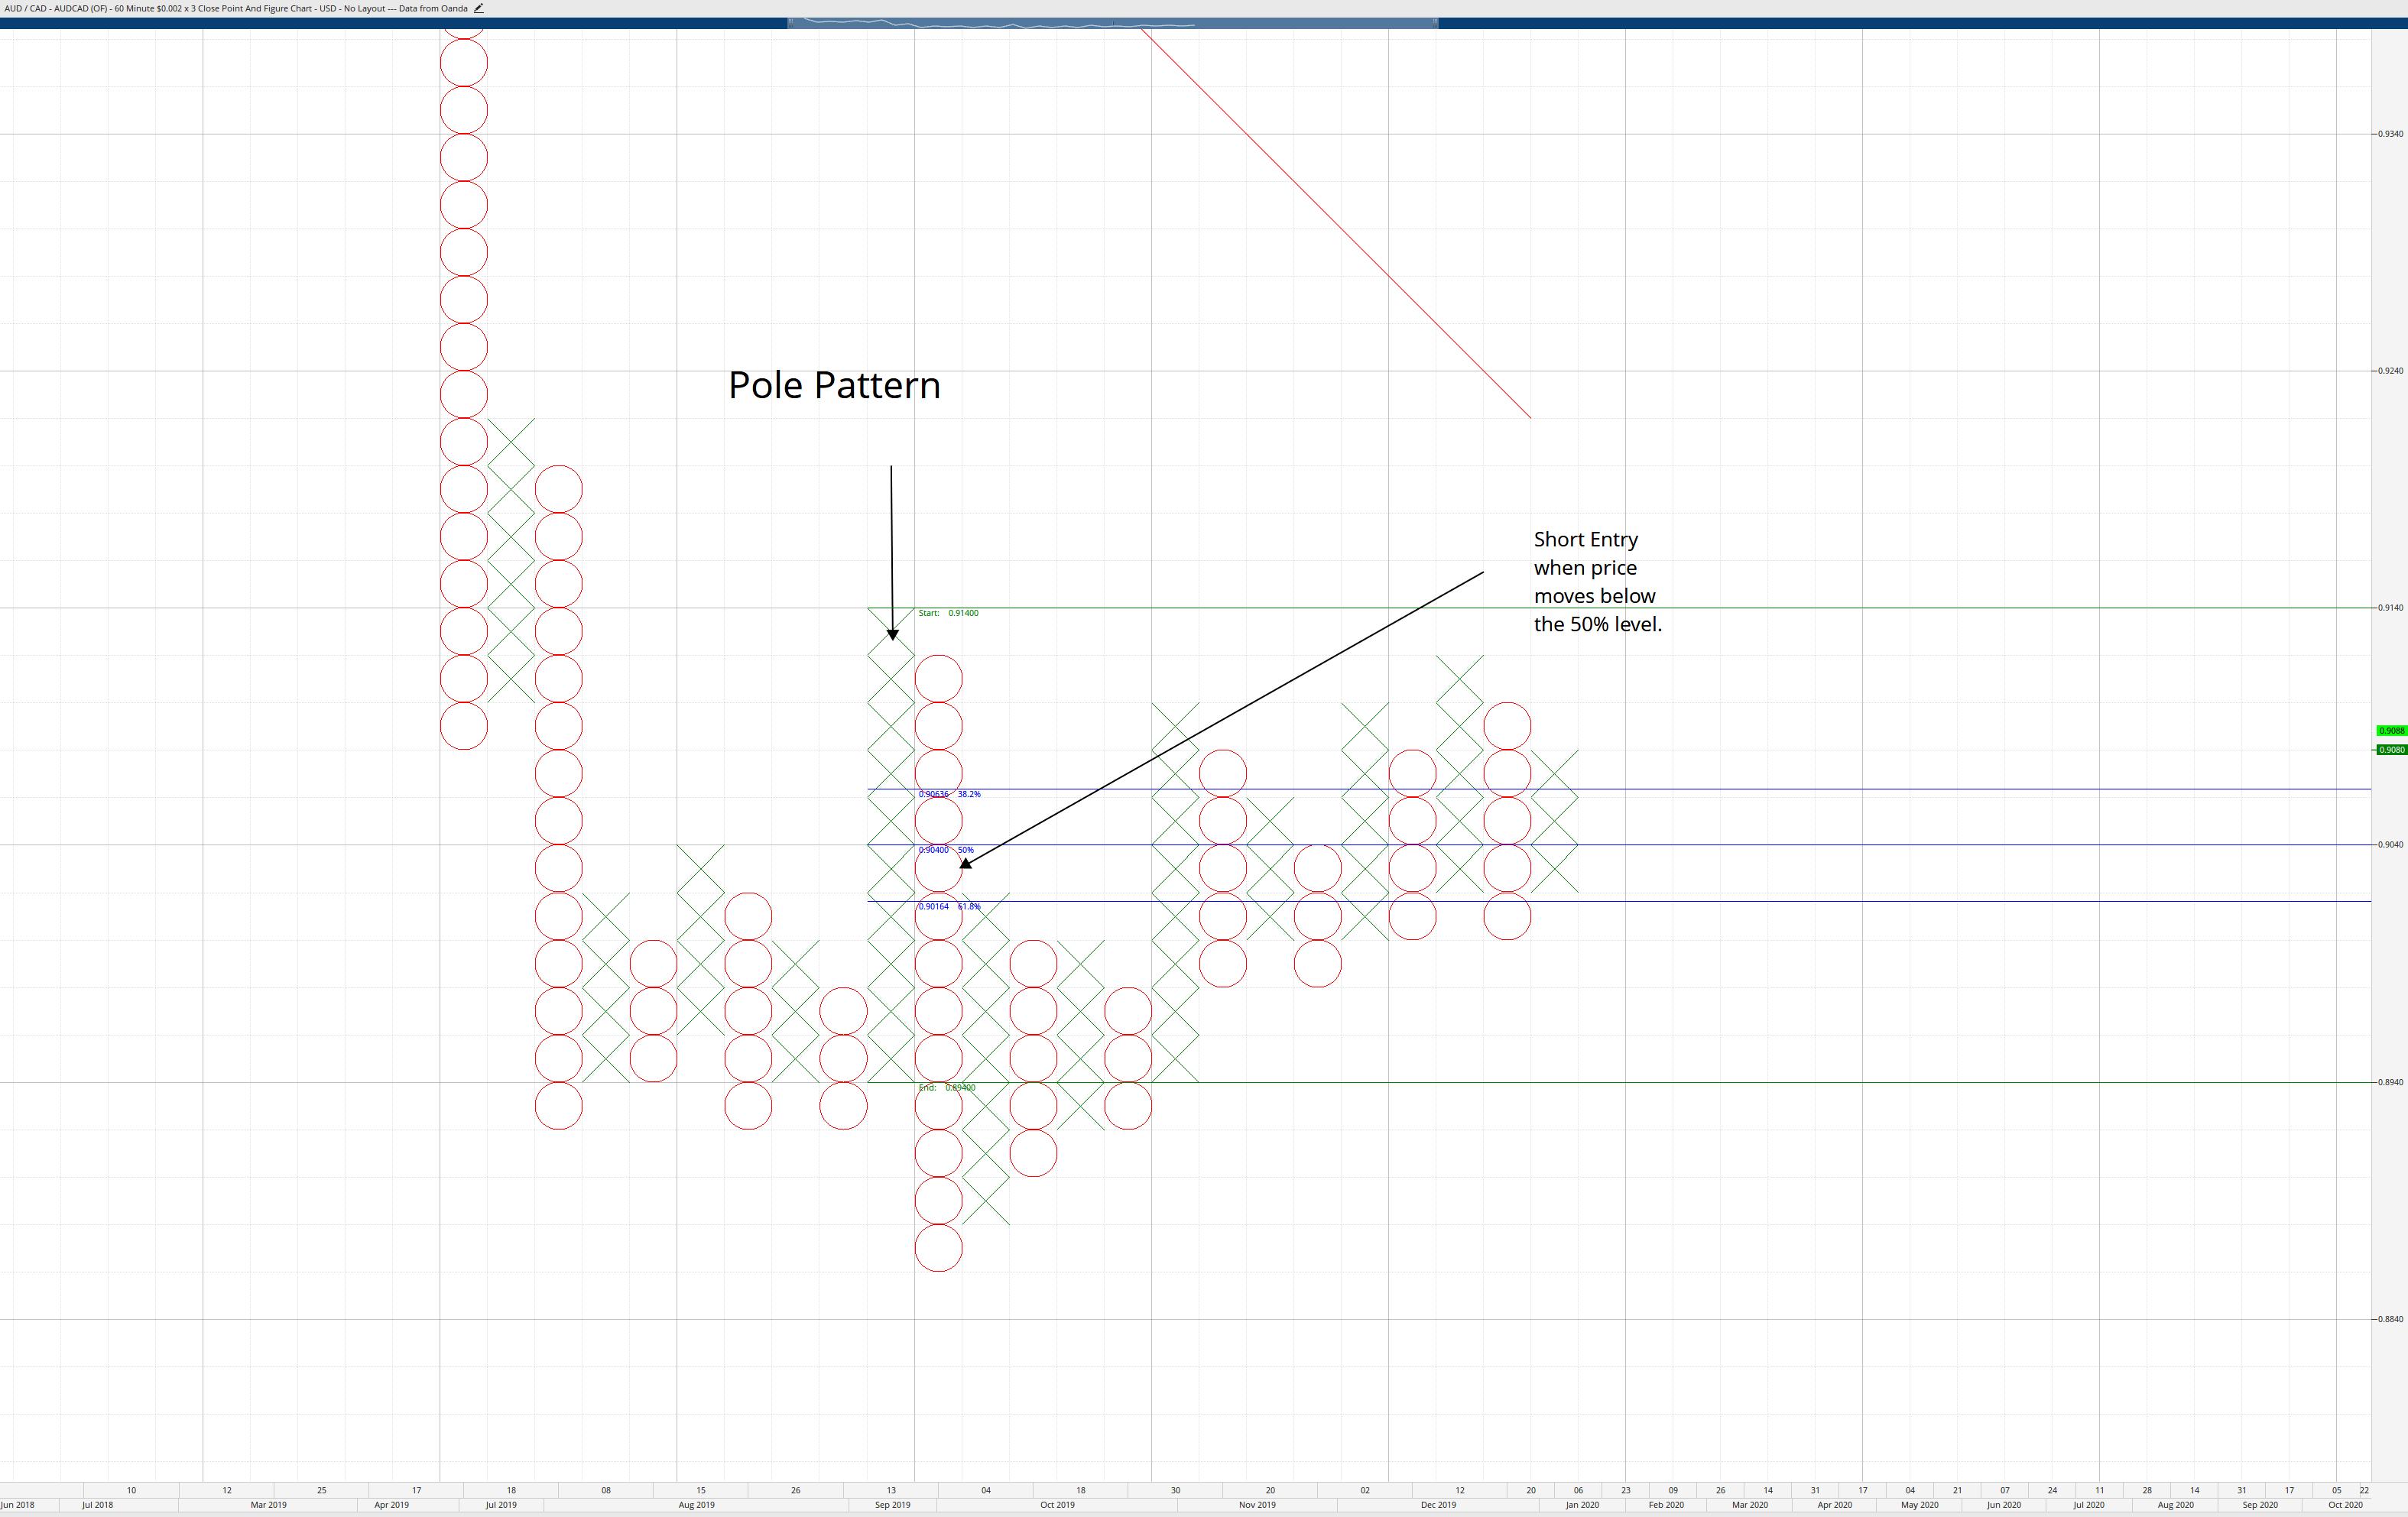 Pole Pattern